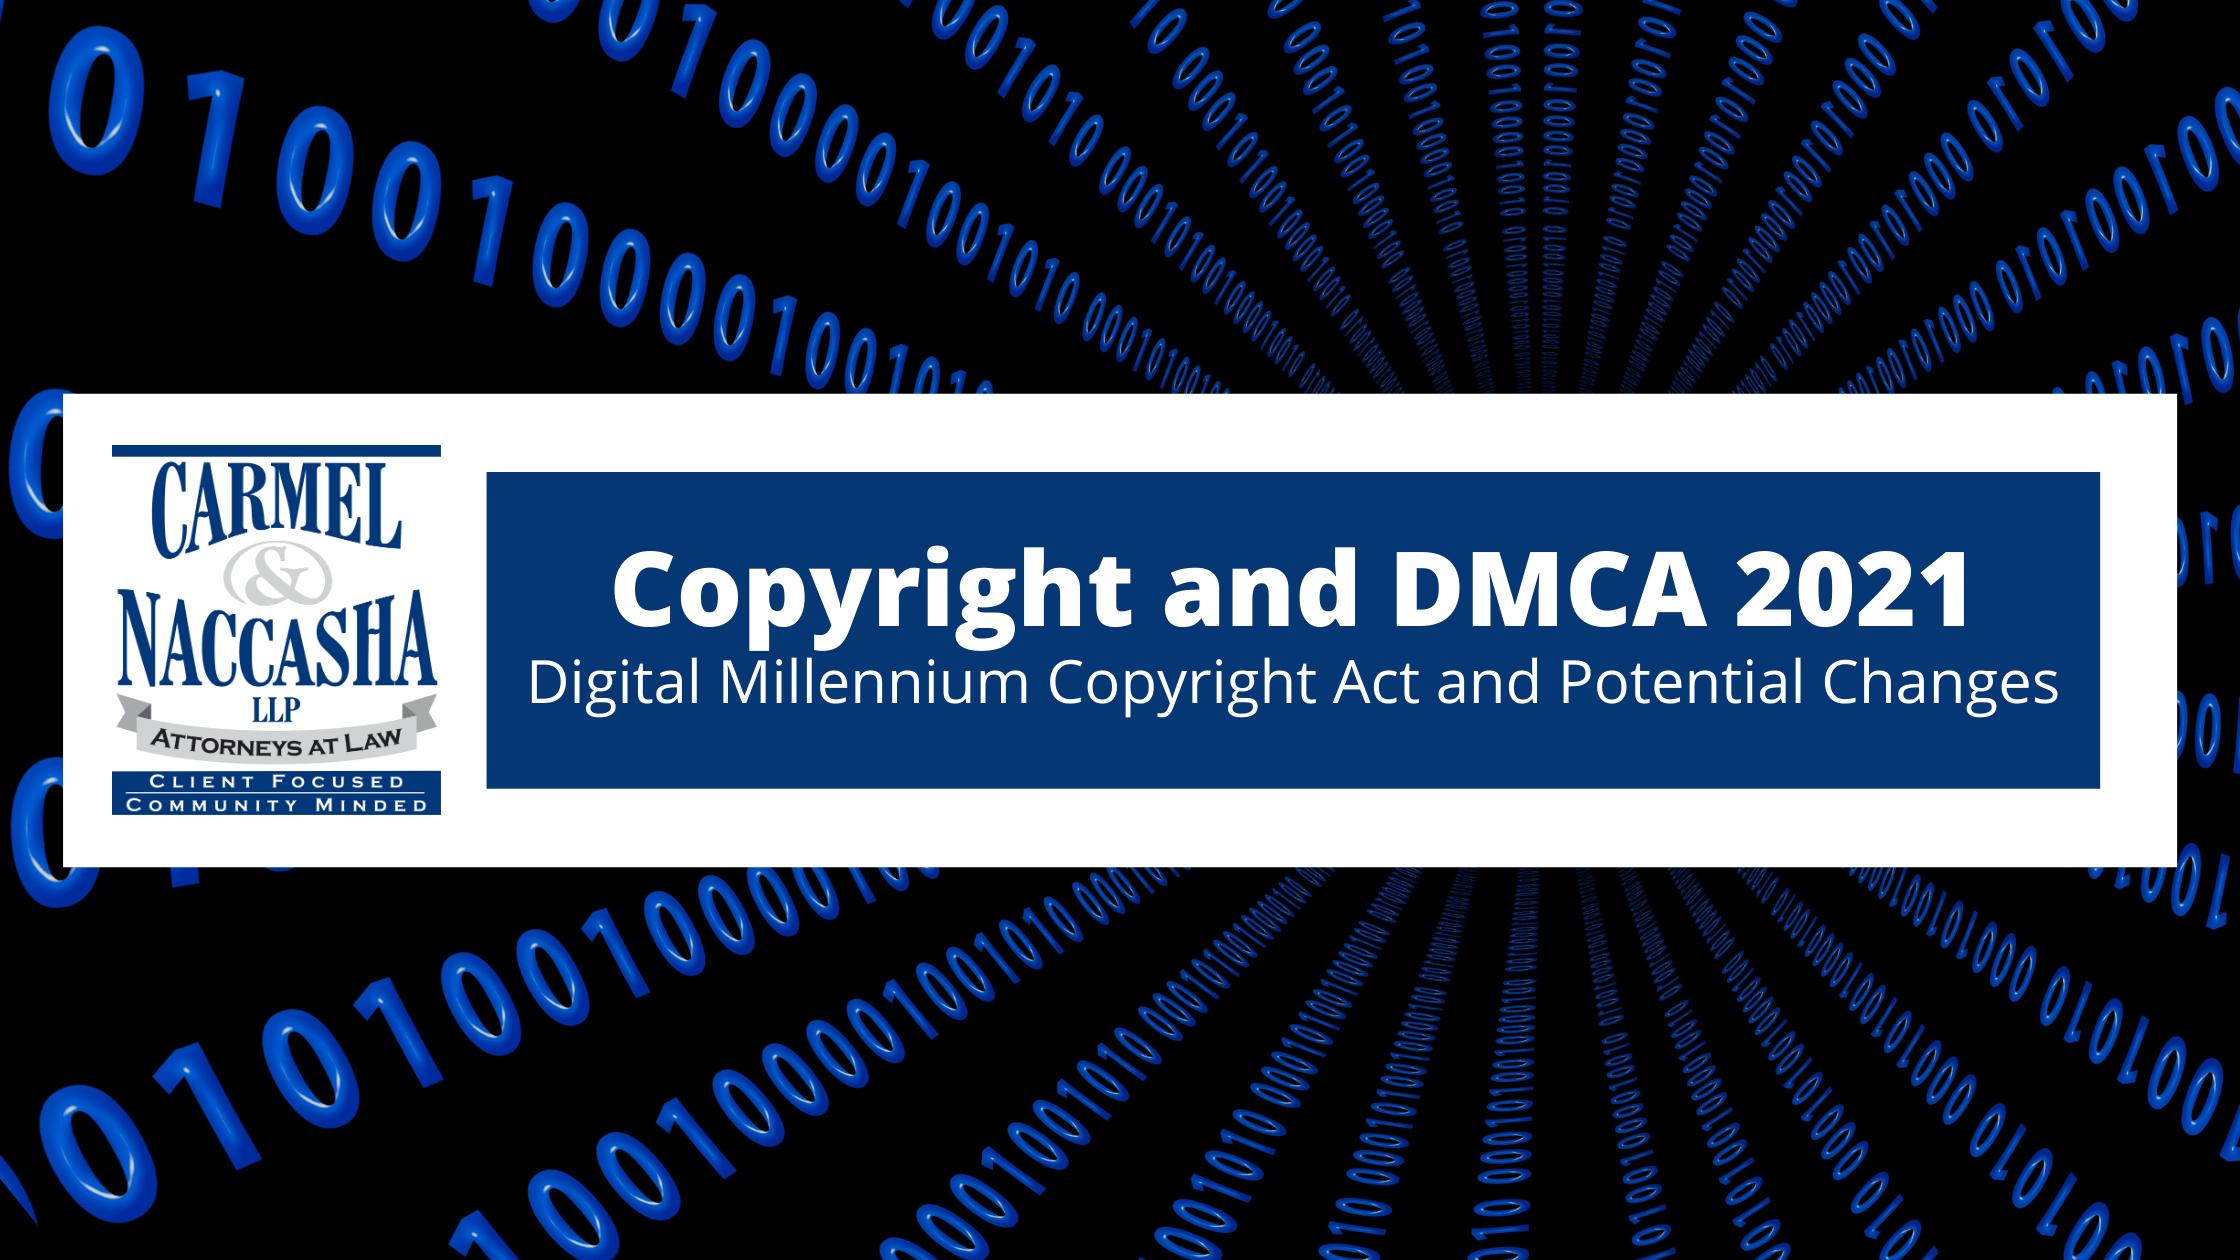 Copyright and Digital Millennium Copyright Act